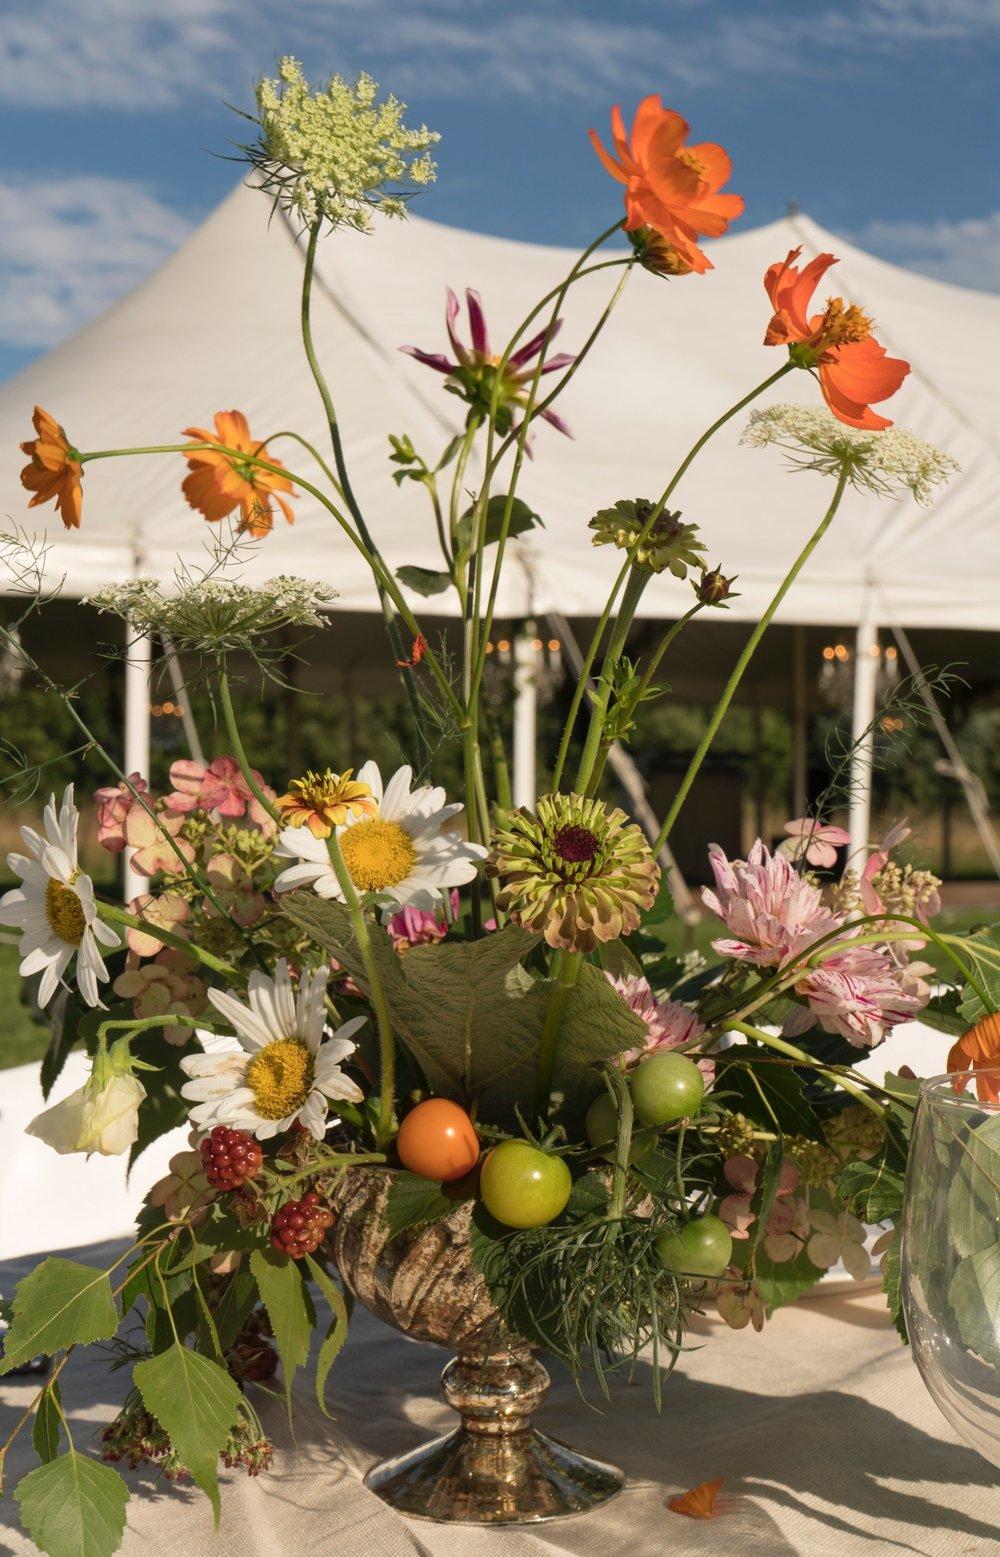 hudson-valley-farm-weddings-pioneer-farm-weddings-warwick-ny-flower-bouquet.jpg